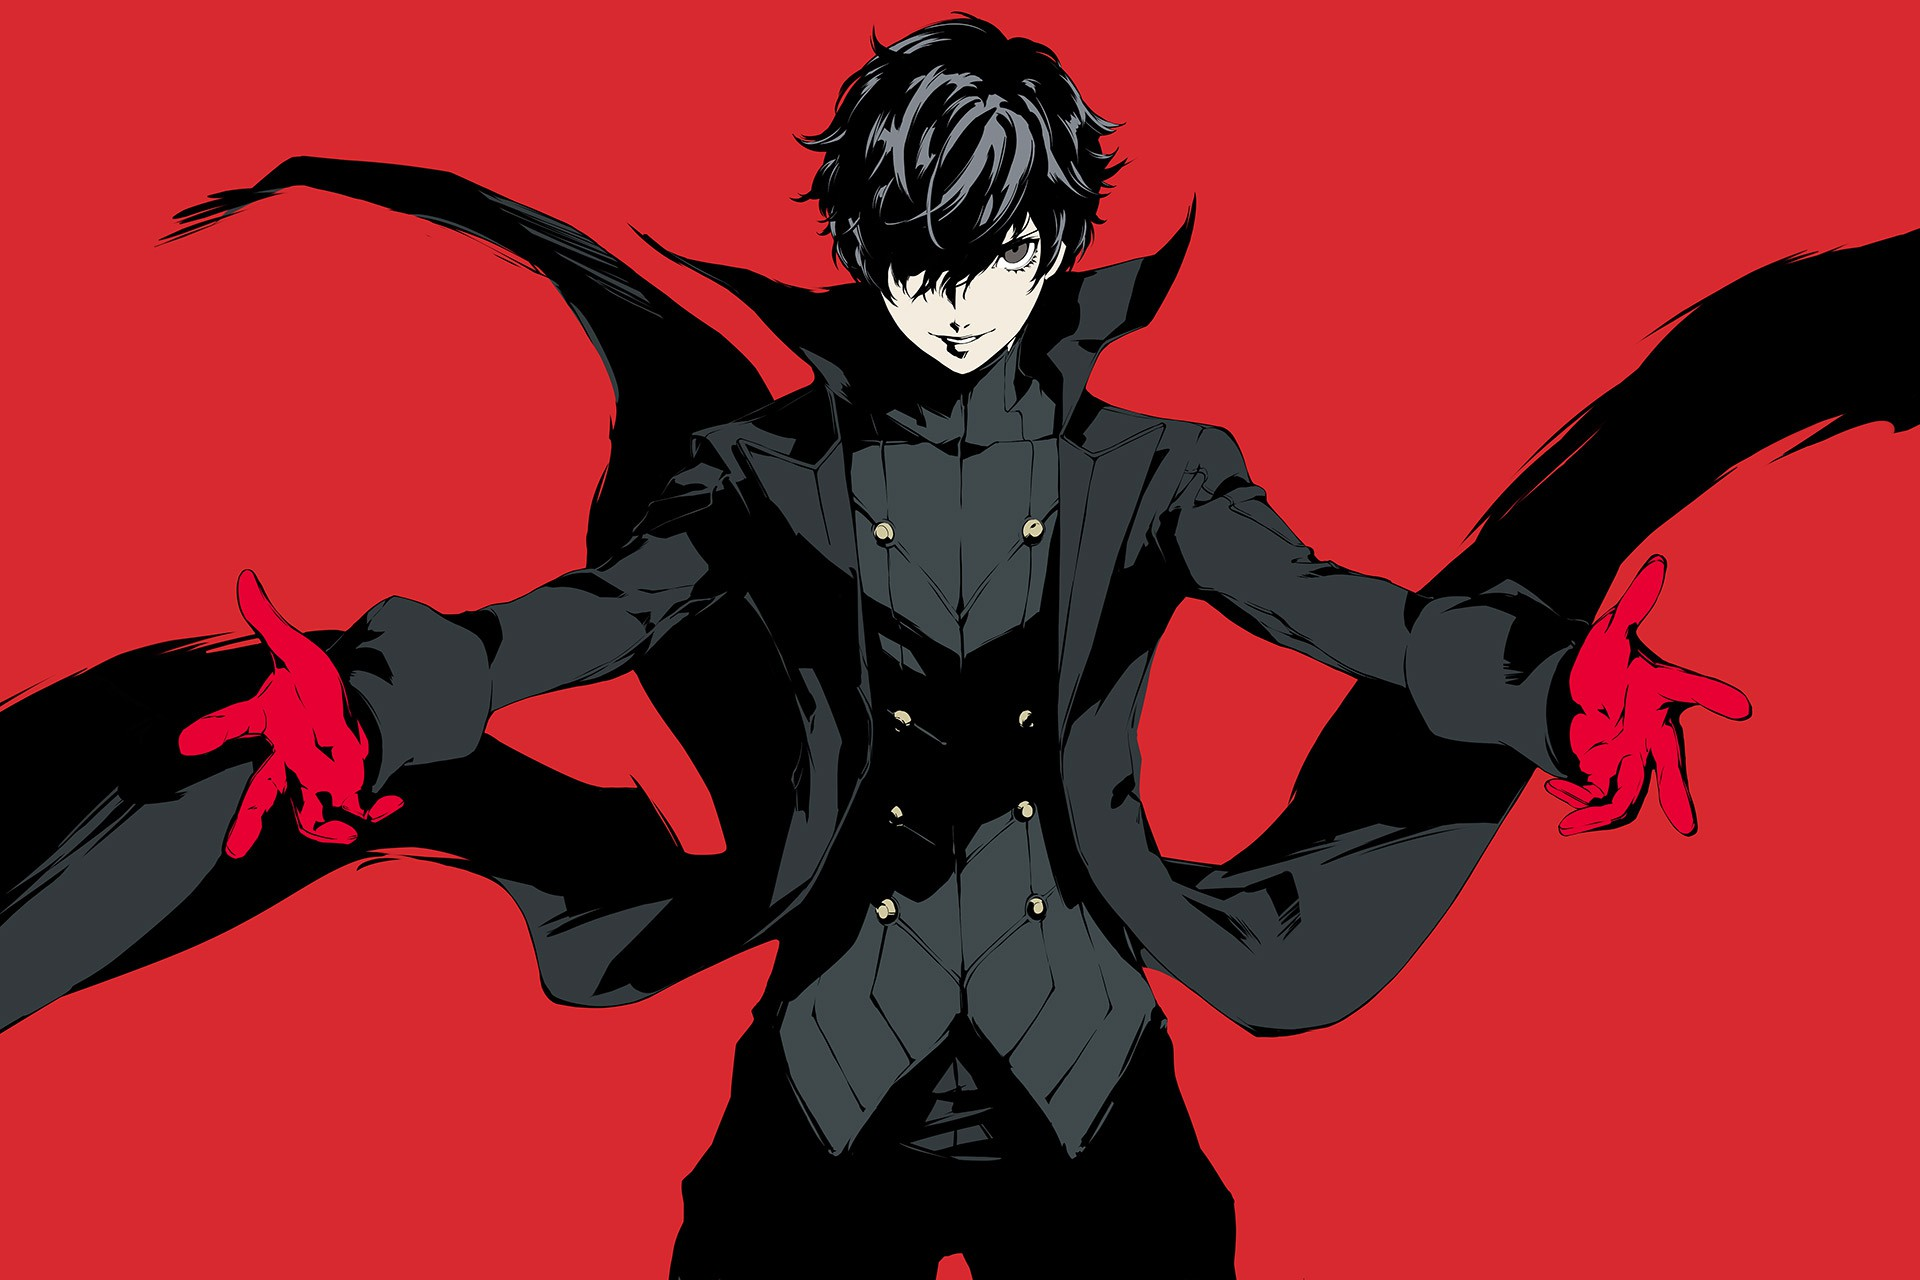 https://www.candb.com/site/candb/images/artwork/Joker_Persona-5_Atlus_1920.jpg